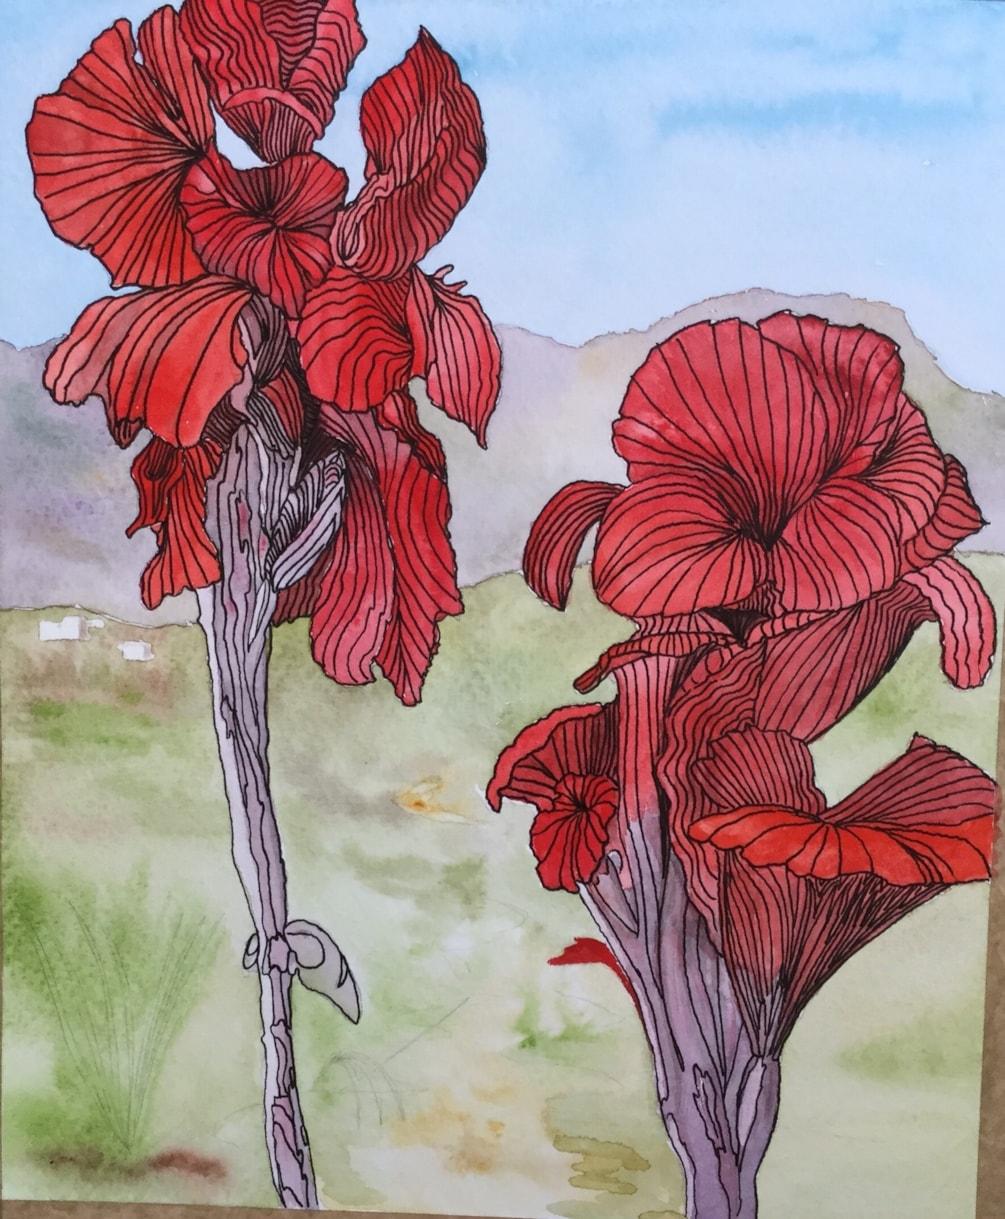 Flowers in Northern Cyprus